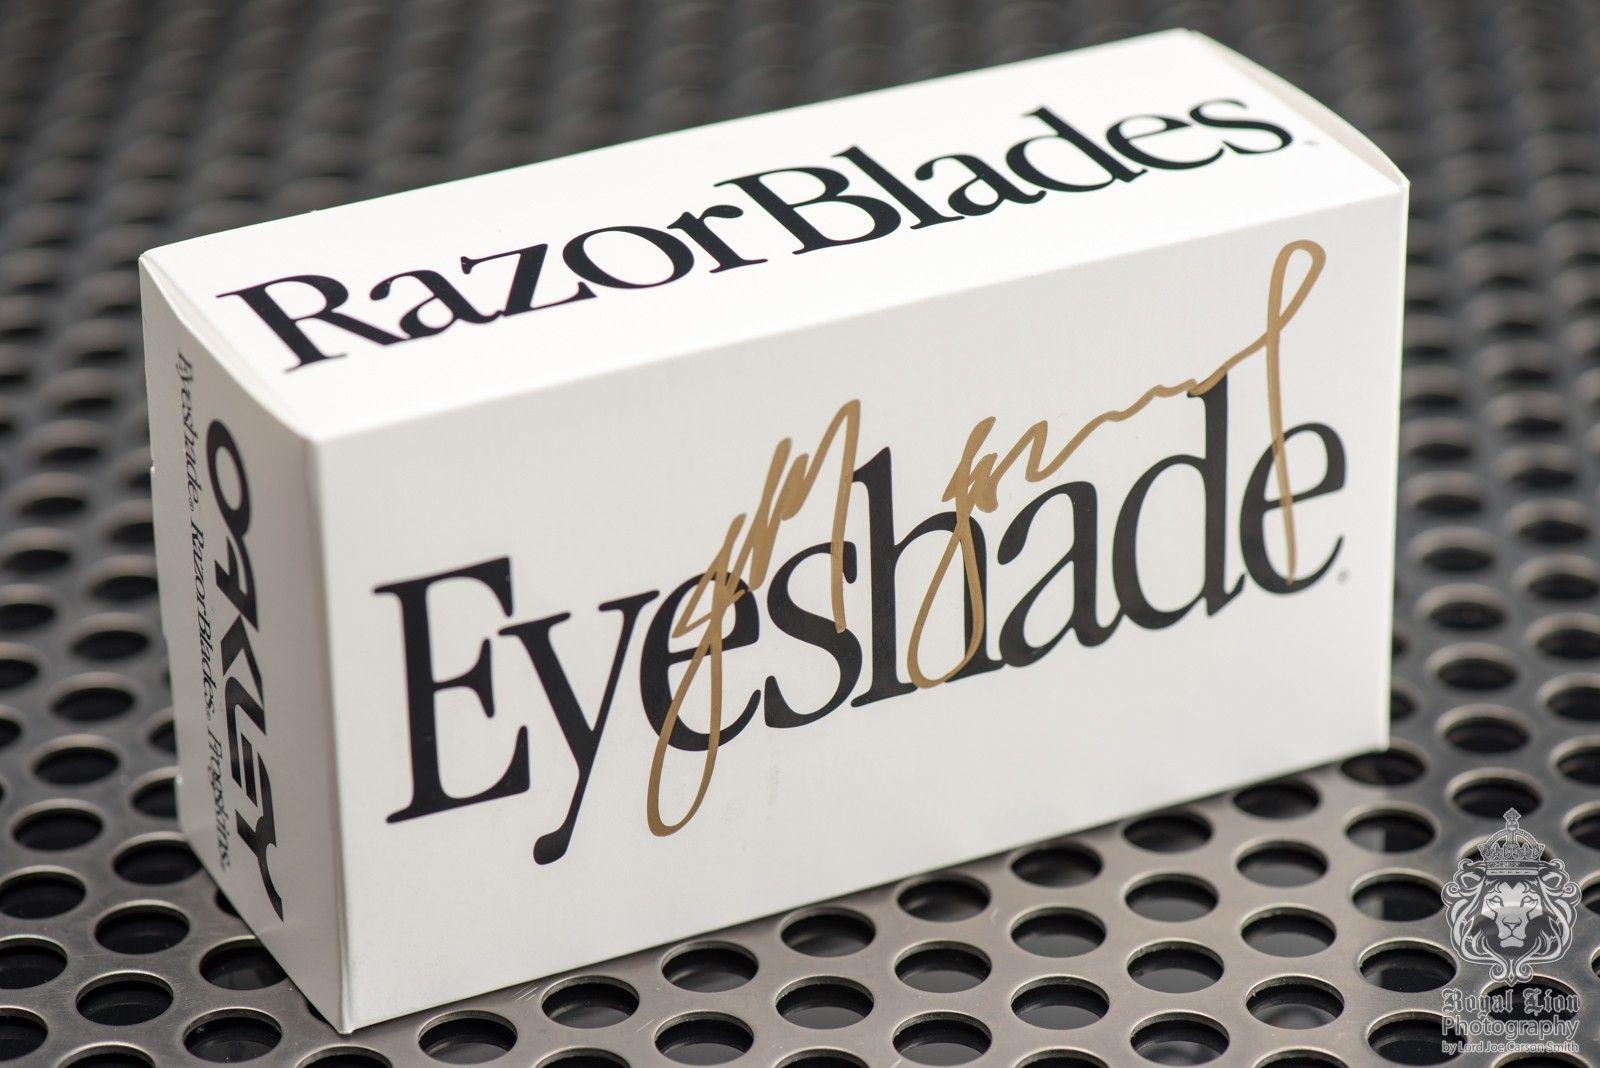 2 of 3 Signed Oakley Heritage Eyeshades by Jim Jannard - Black with Grey - ND8_3478.jpg